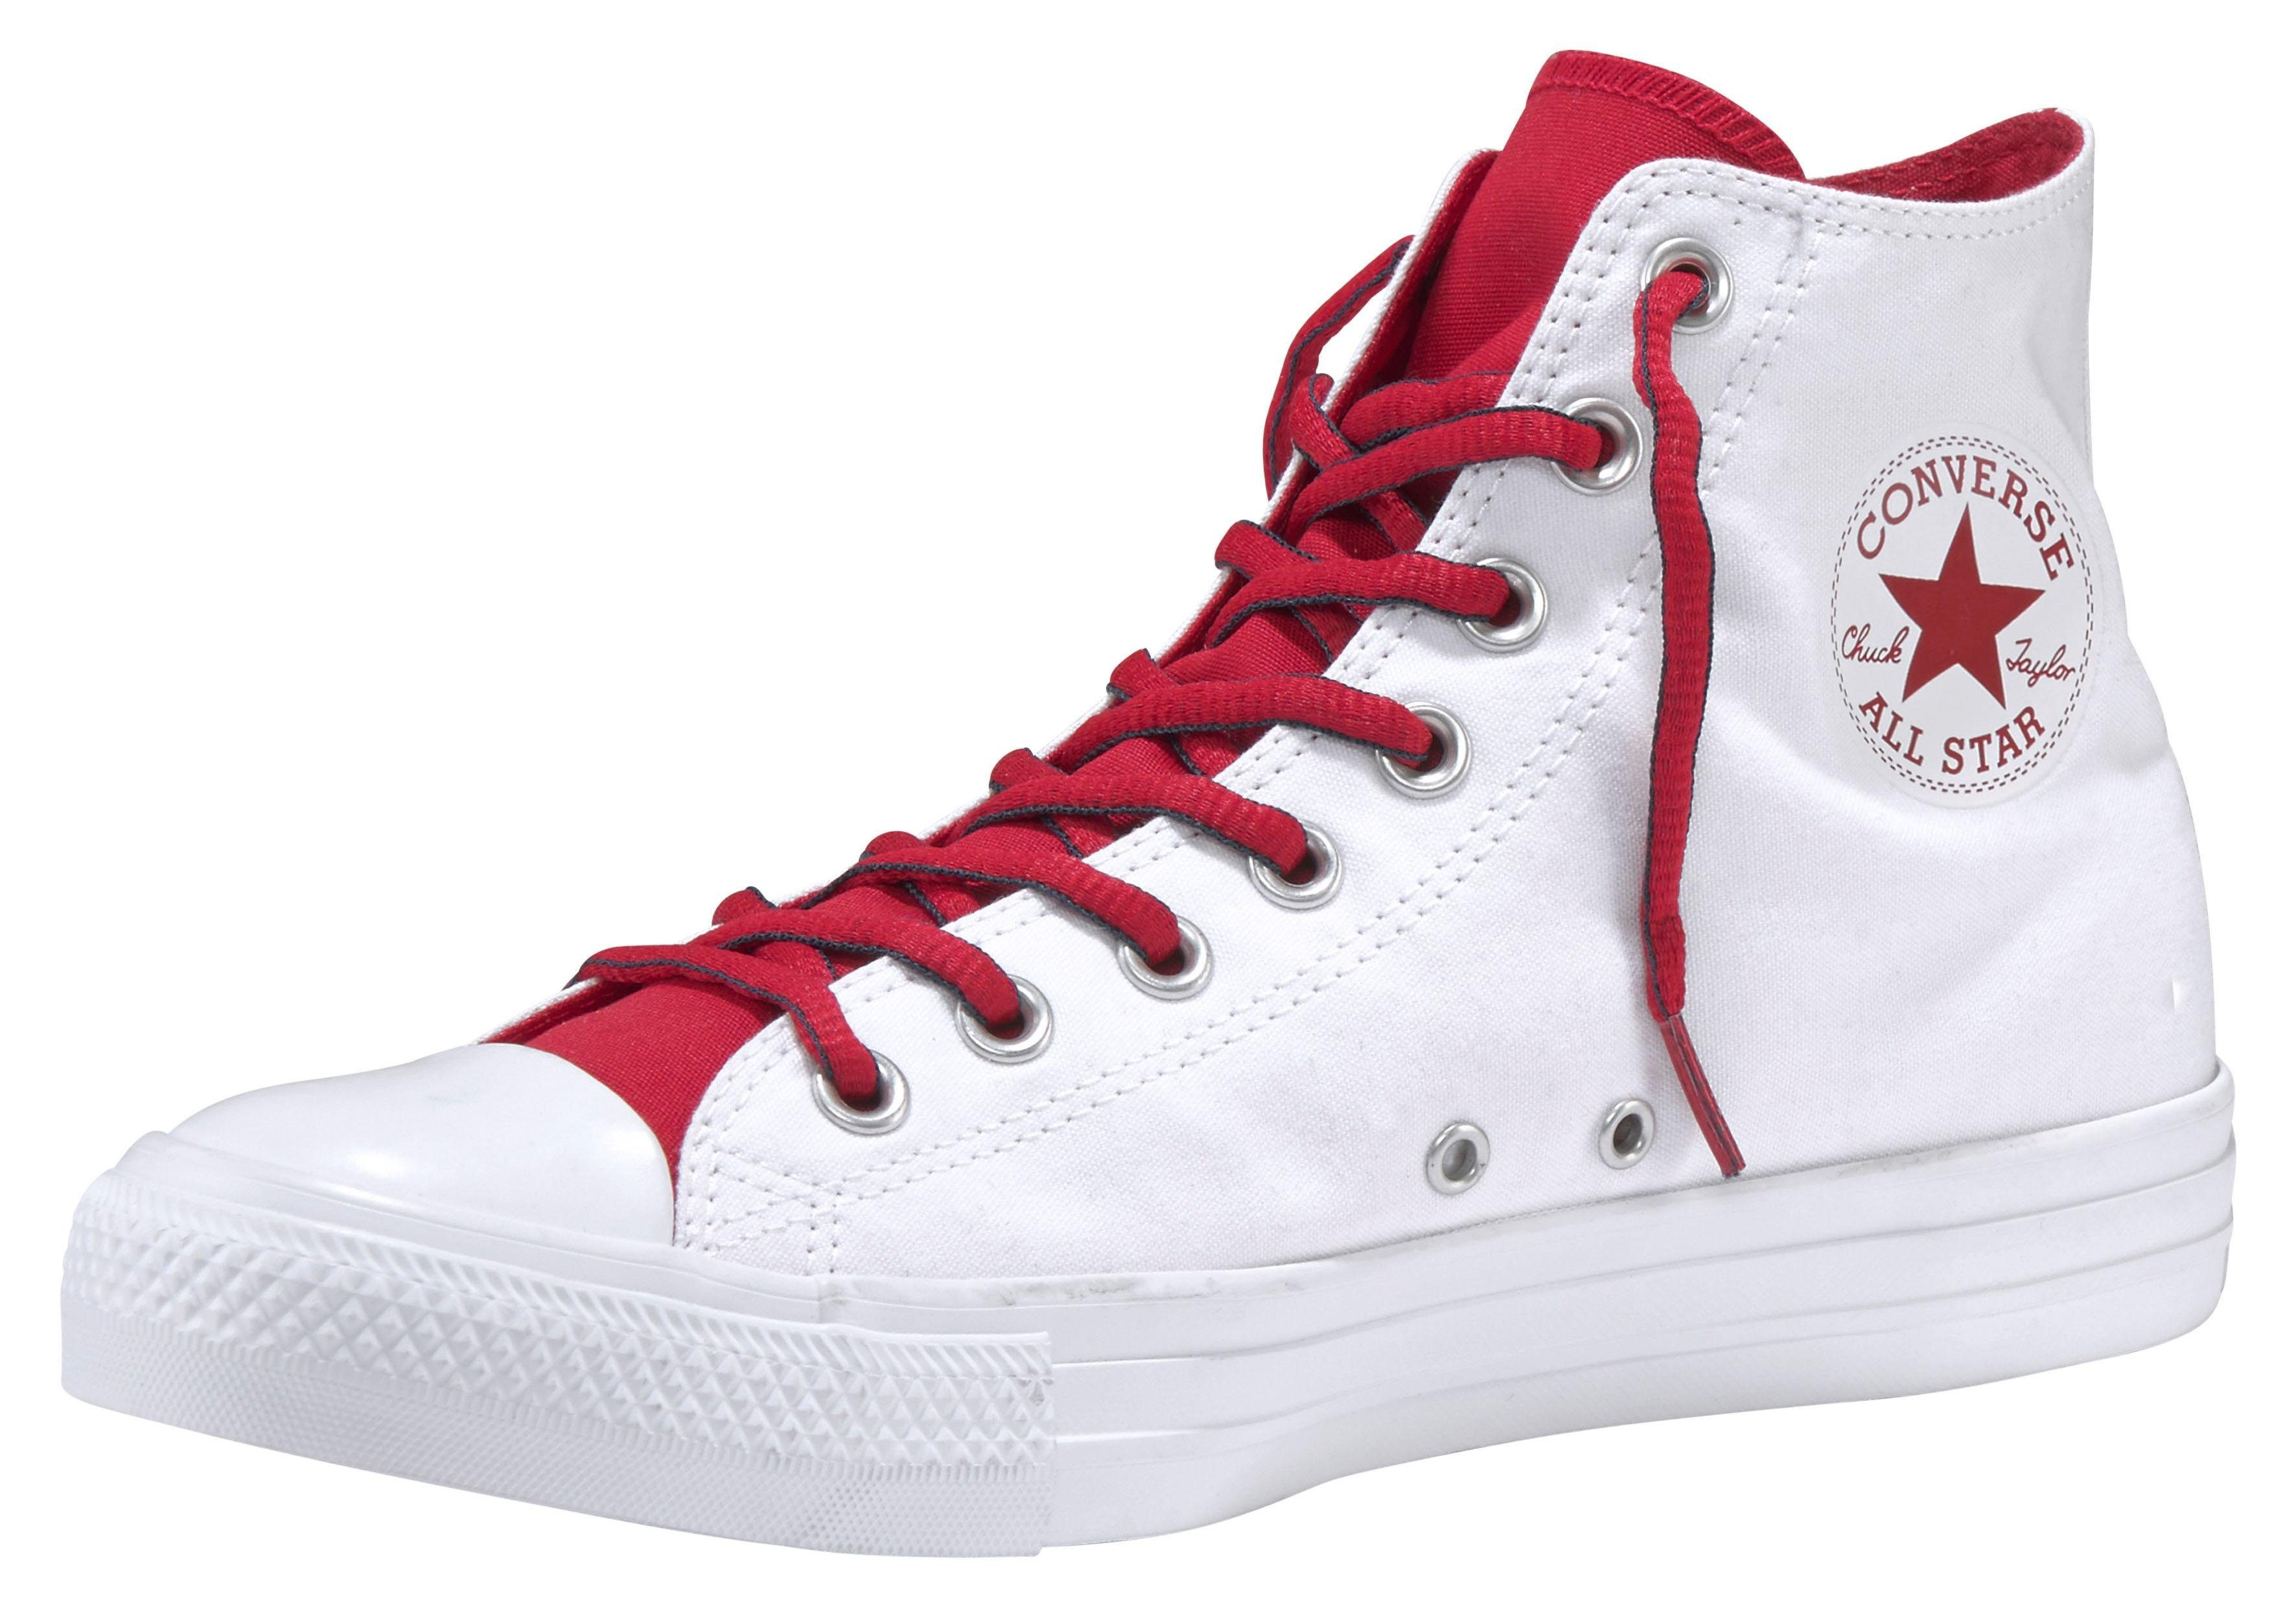 Converse Chuck Taylor All Star Hi Court Prep Block Sneaker online kaufen  weiß-navy-rot